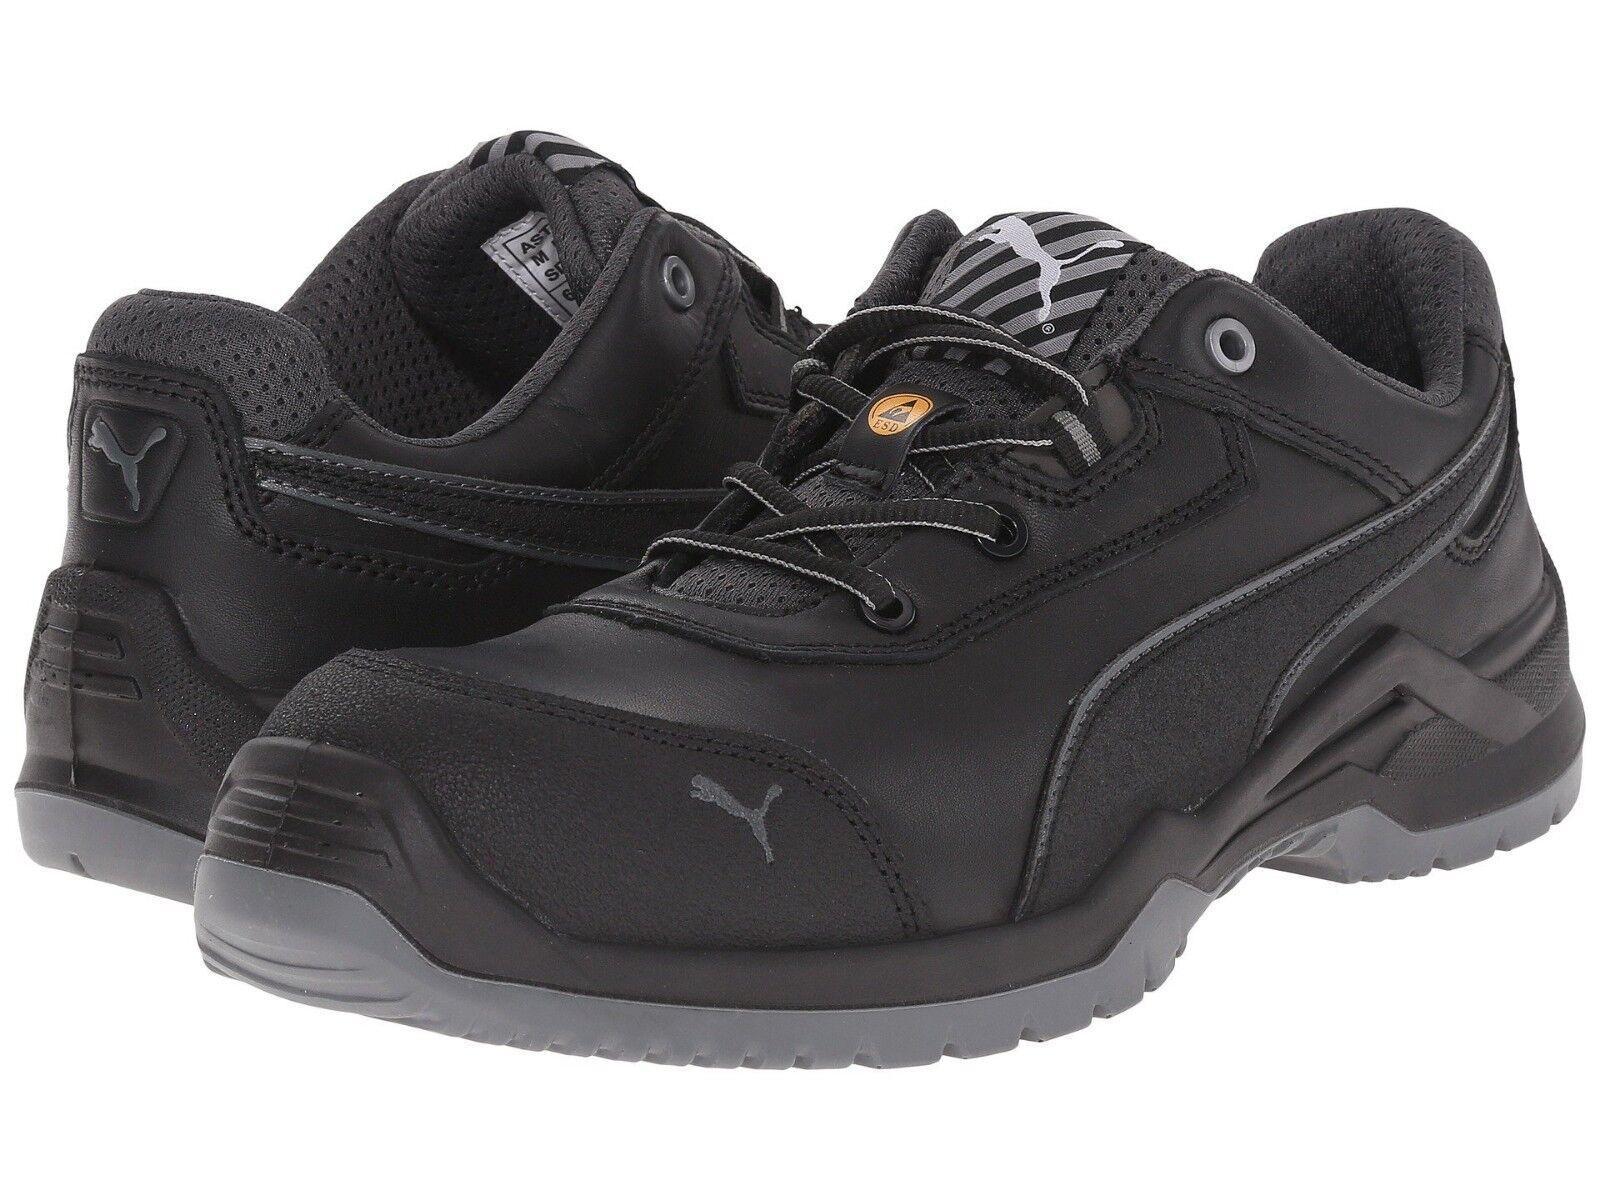 Puma Men's 644245 Argon Low Black S3 ESD SRC Fibreglass Cap Safety Shoes